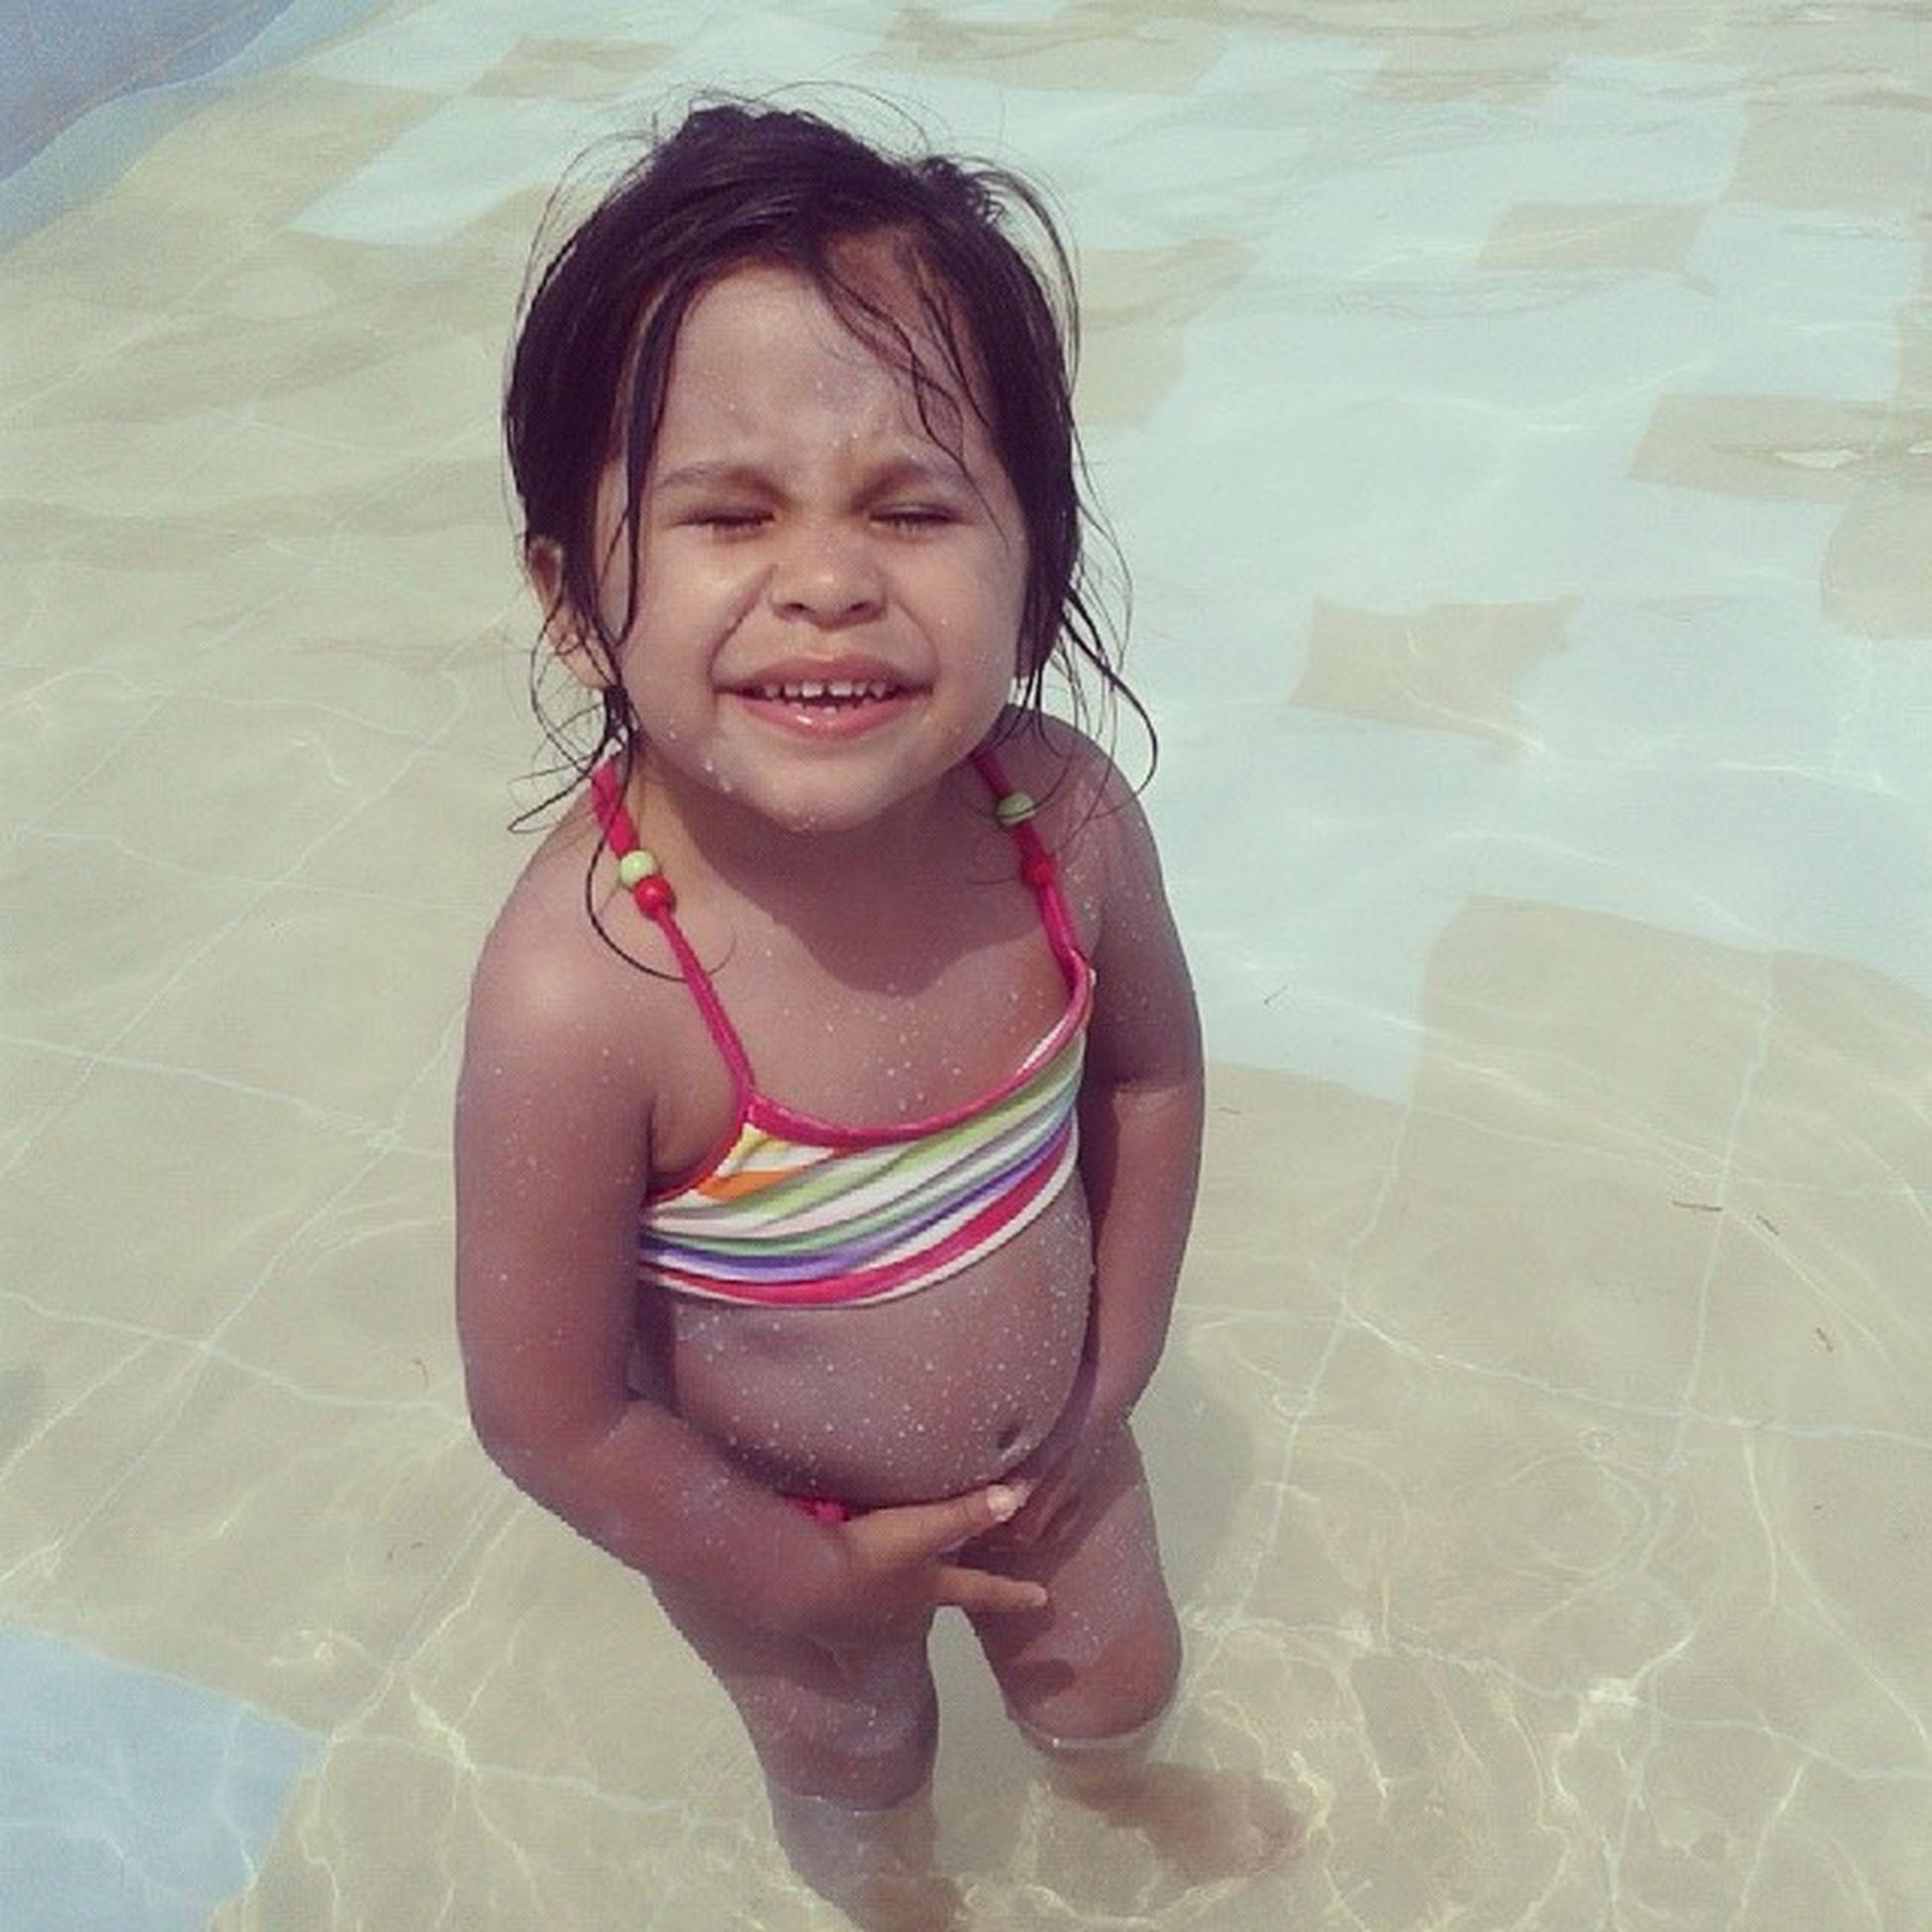 Valentina en la piscina Verano2014 Babygirl Igersperu Club ahijada